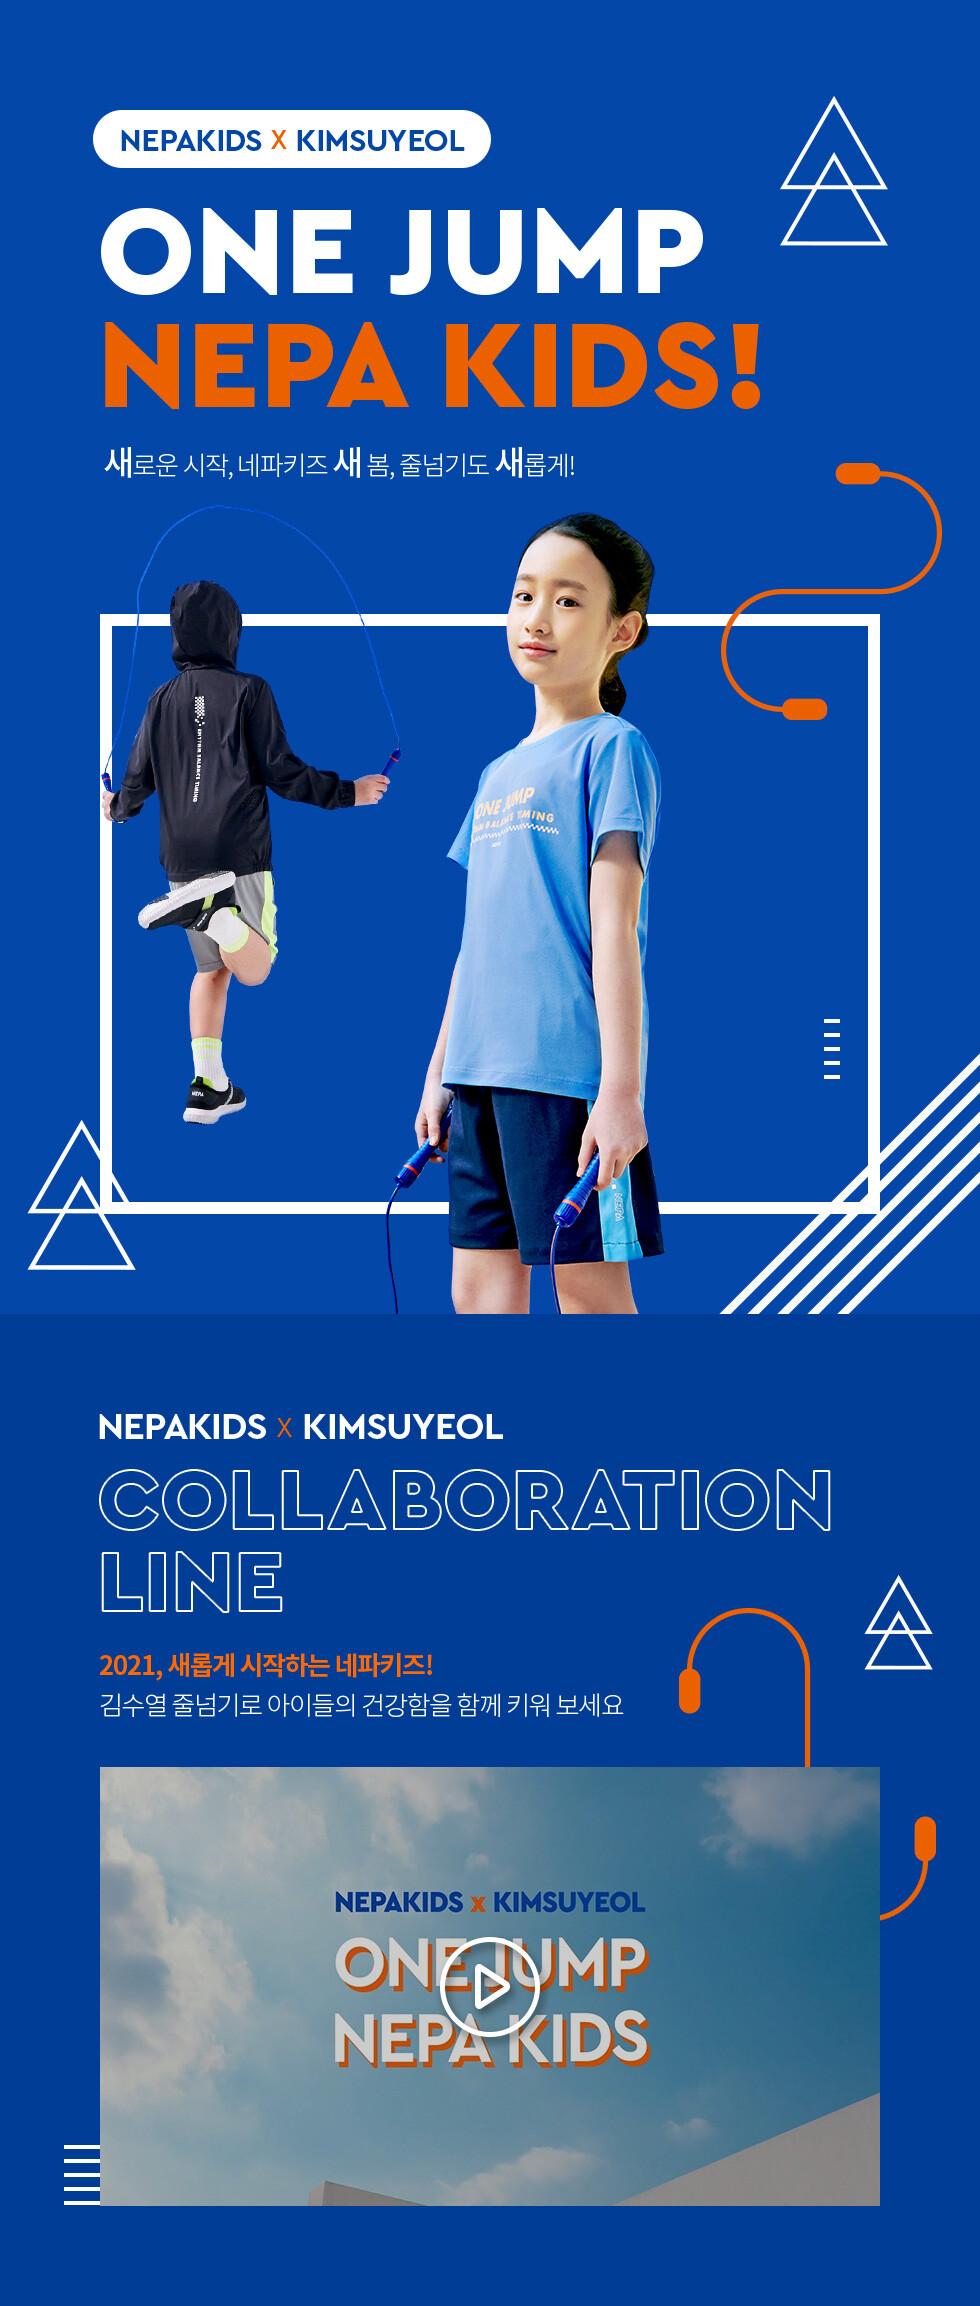 nepakids x kimsuyeol ONE JUMP NEPA KIDS! 새로운 시작, 네파키즈 새 봄, 줄넘기도 새롭게! COLLABORATION LINE 2021, 새롭게 시작하는 네파키즈! 김수열 줄넘기로 아이들의 건강함을 함께 키워 보세요